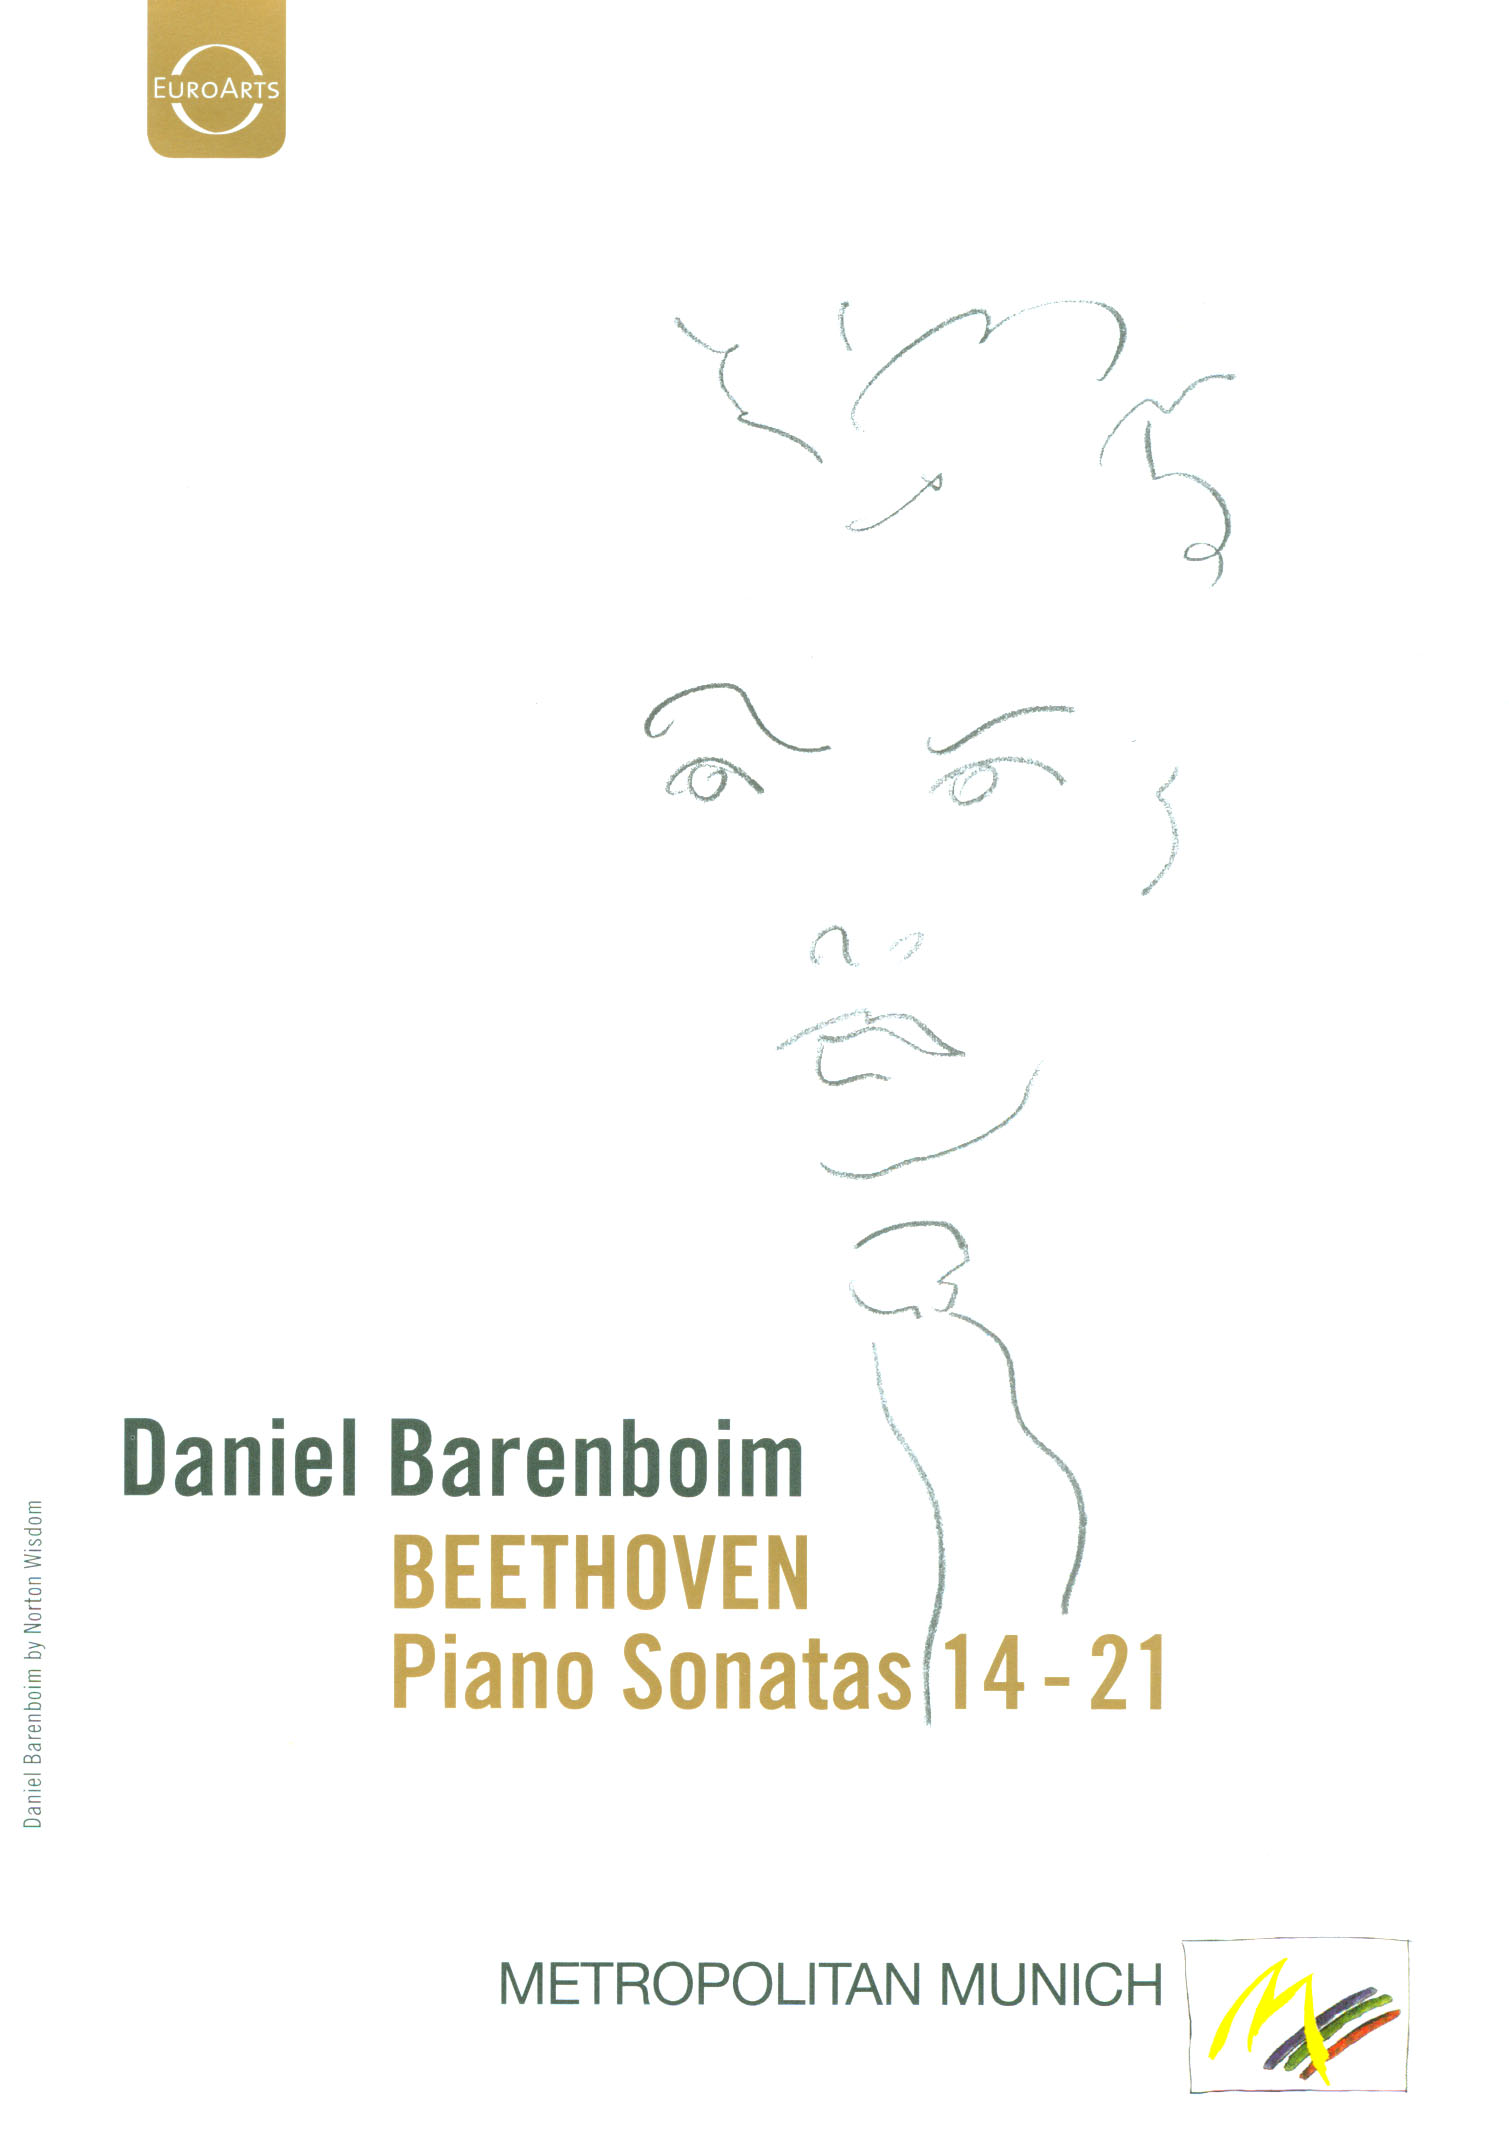 Daniel Barenboim: Beethoven - Piano Sonatas 14-21